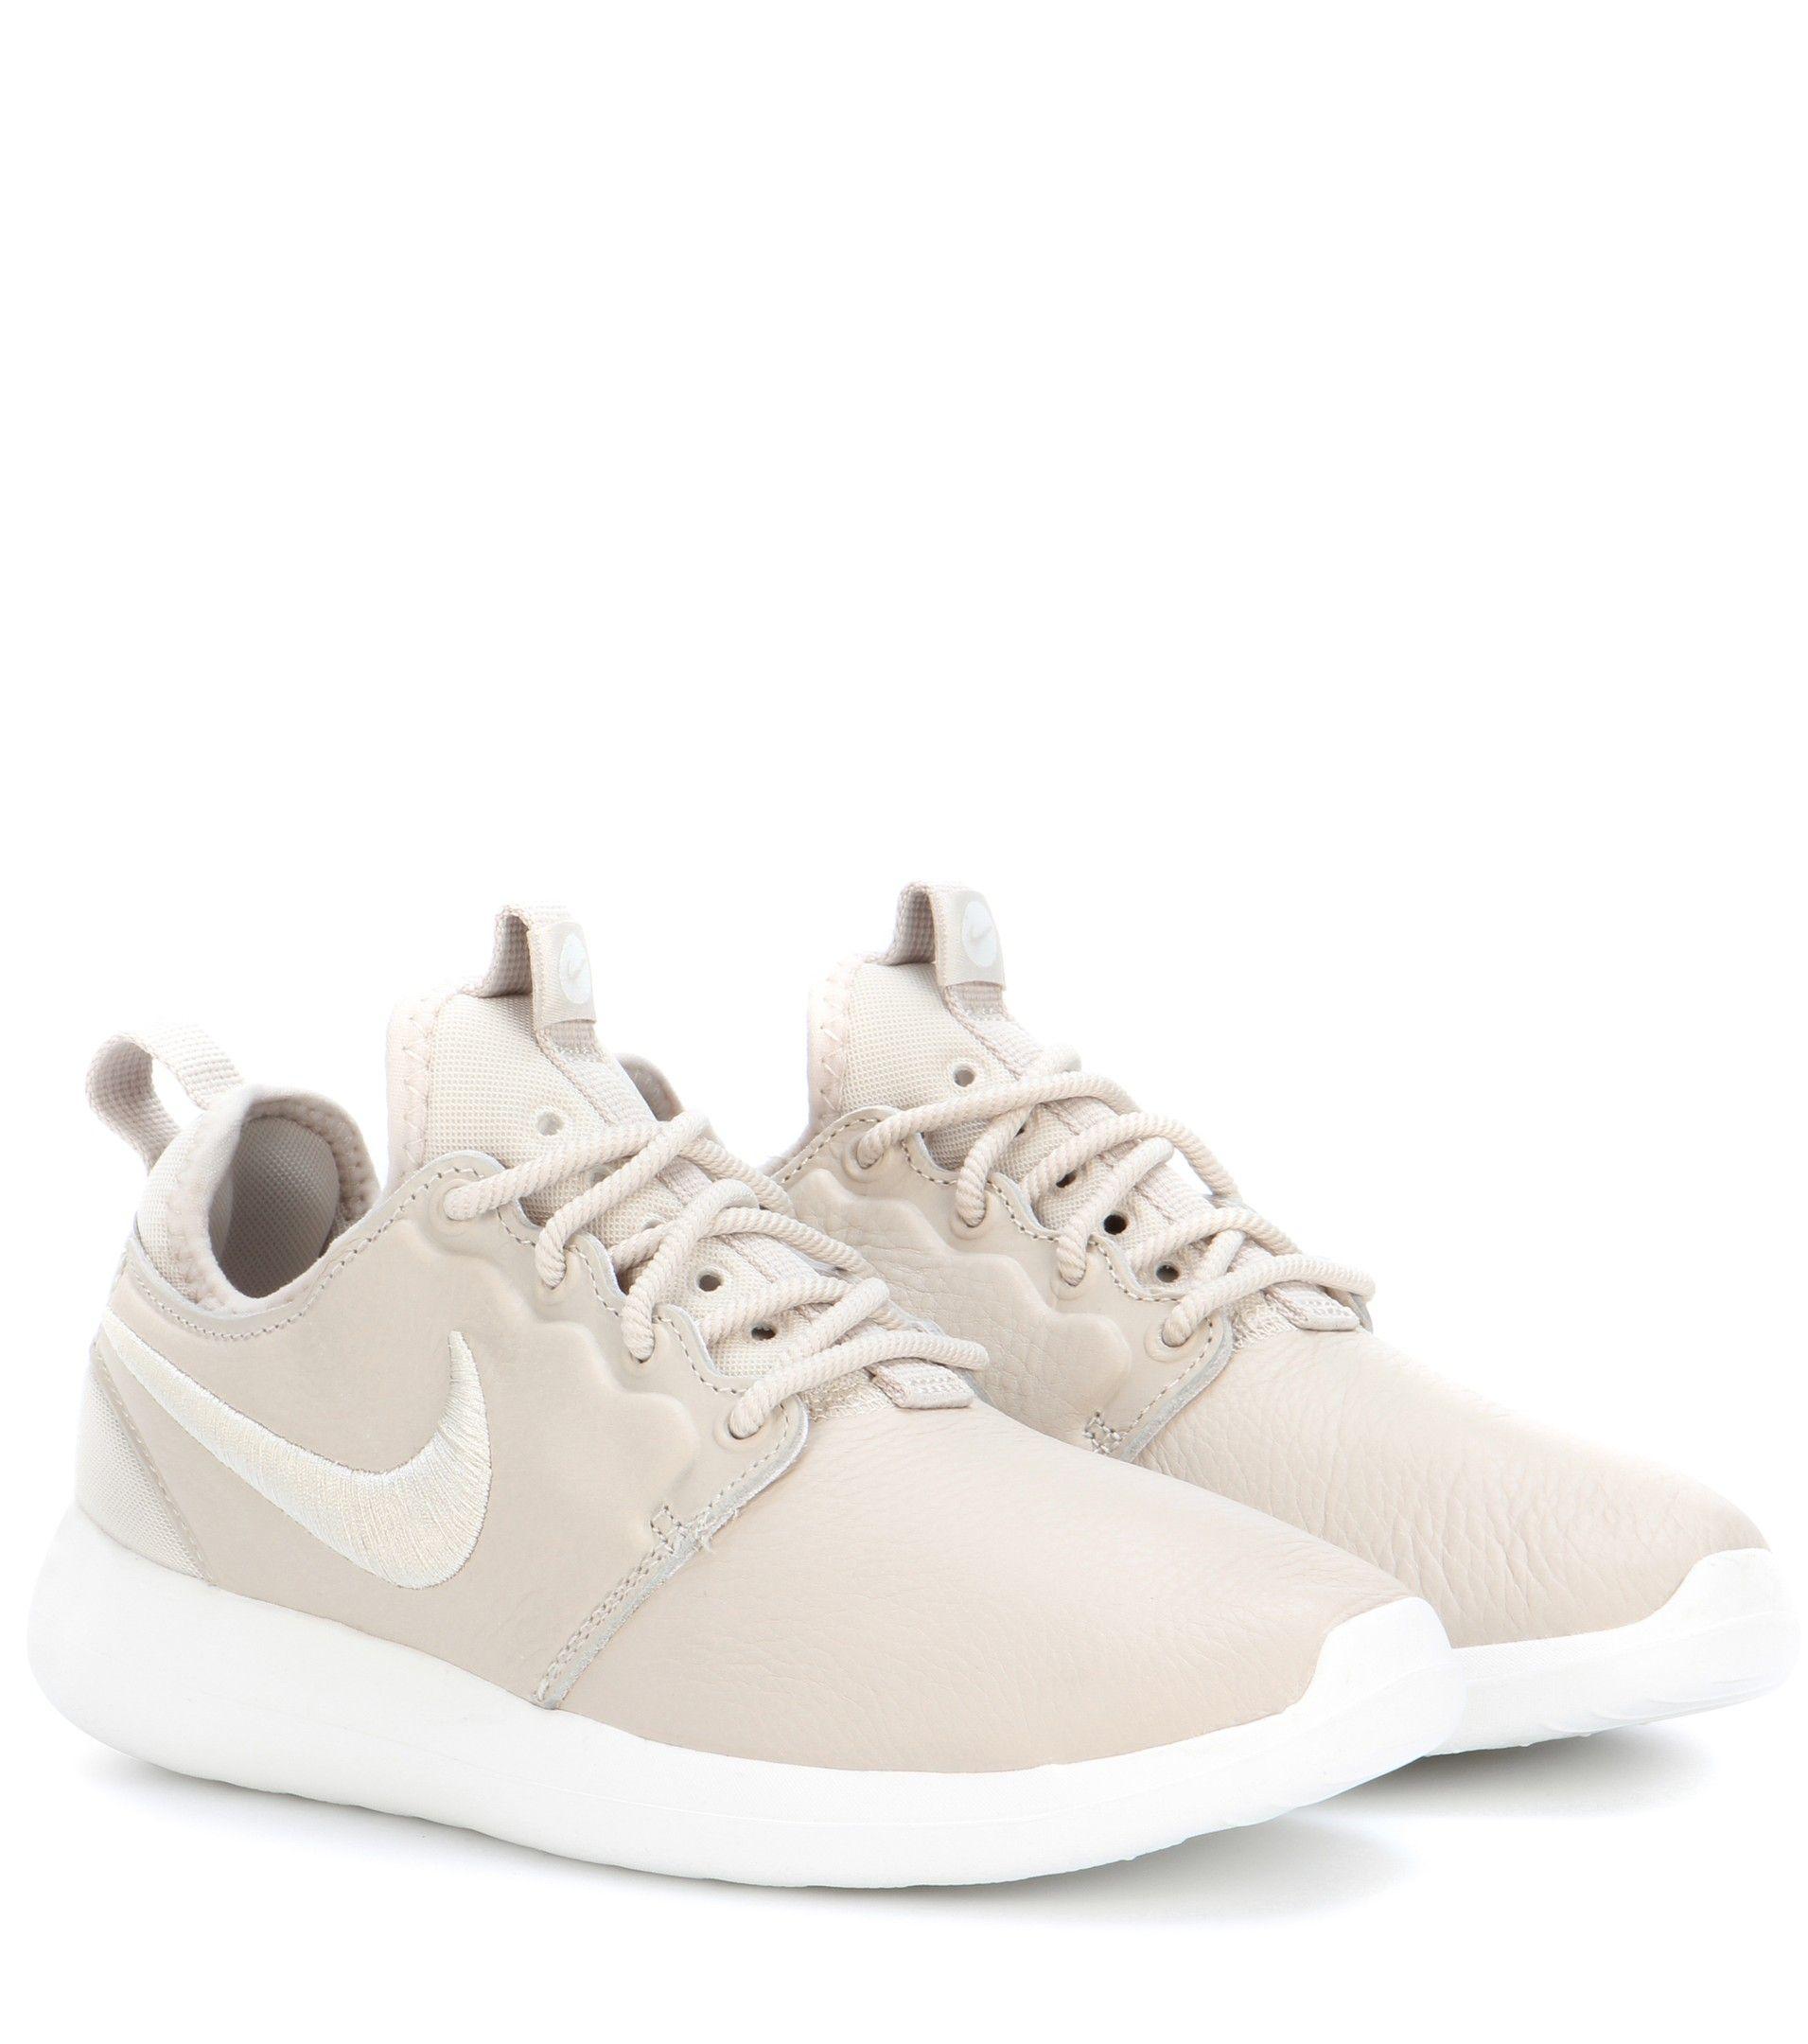 90e1065aeb68d Nike - Nike Roshe Two leather sneakers